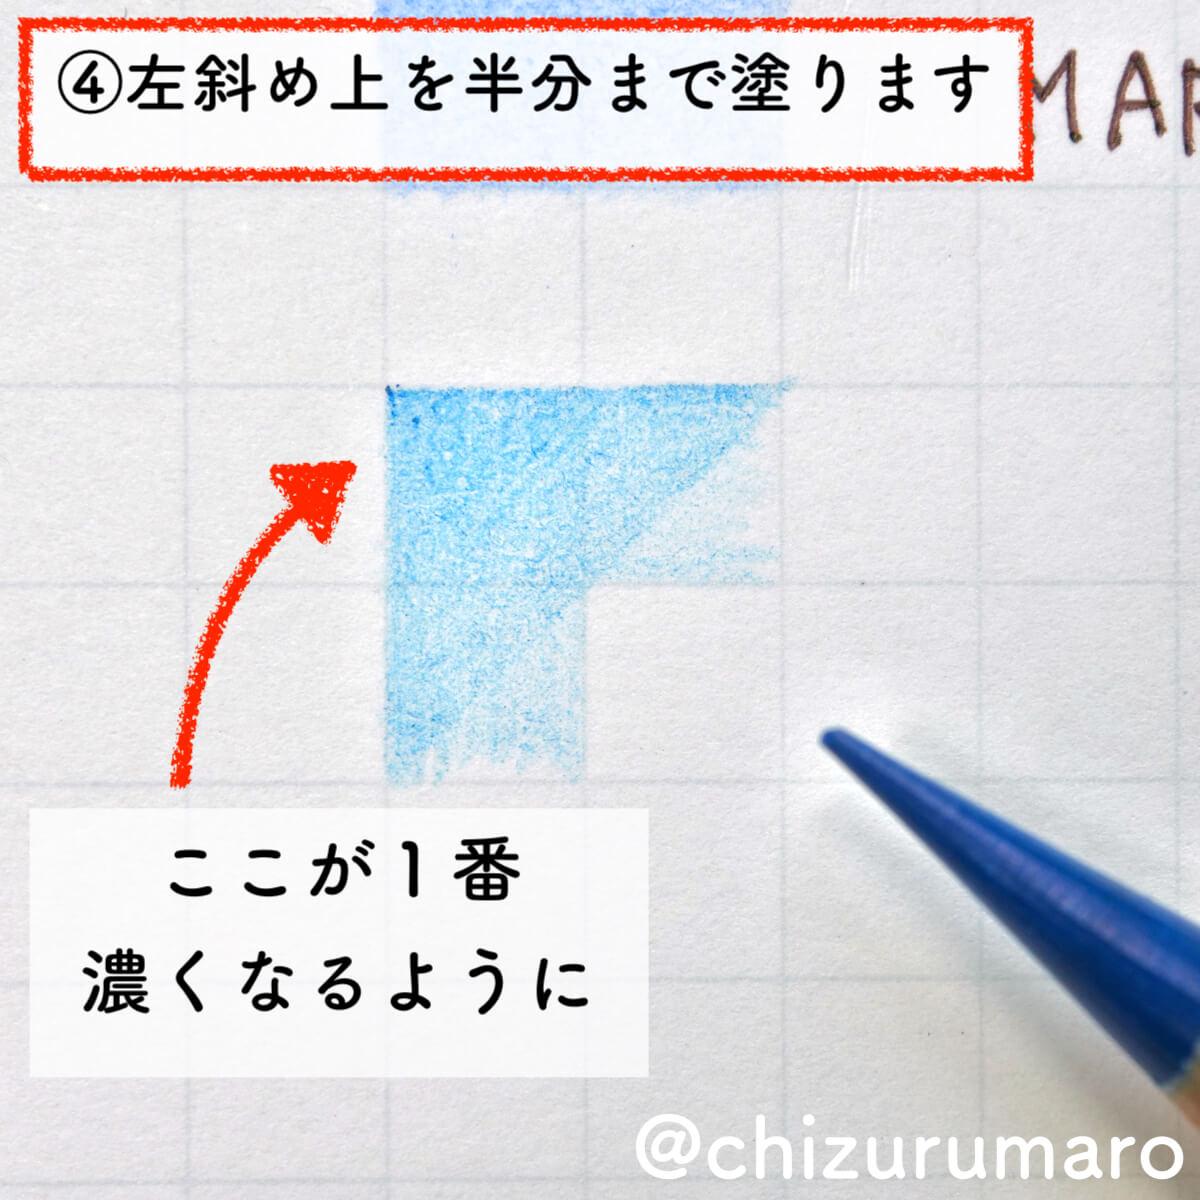 f:id:chizurumaro:20200921220123j:plain